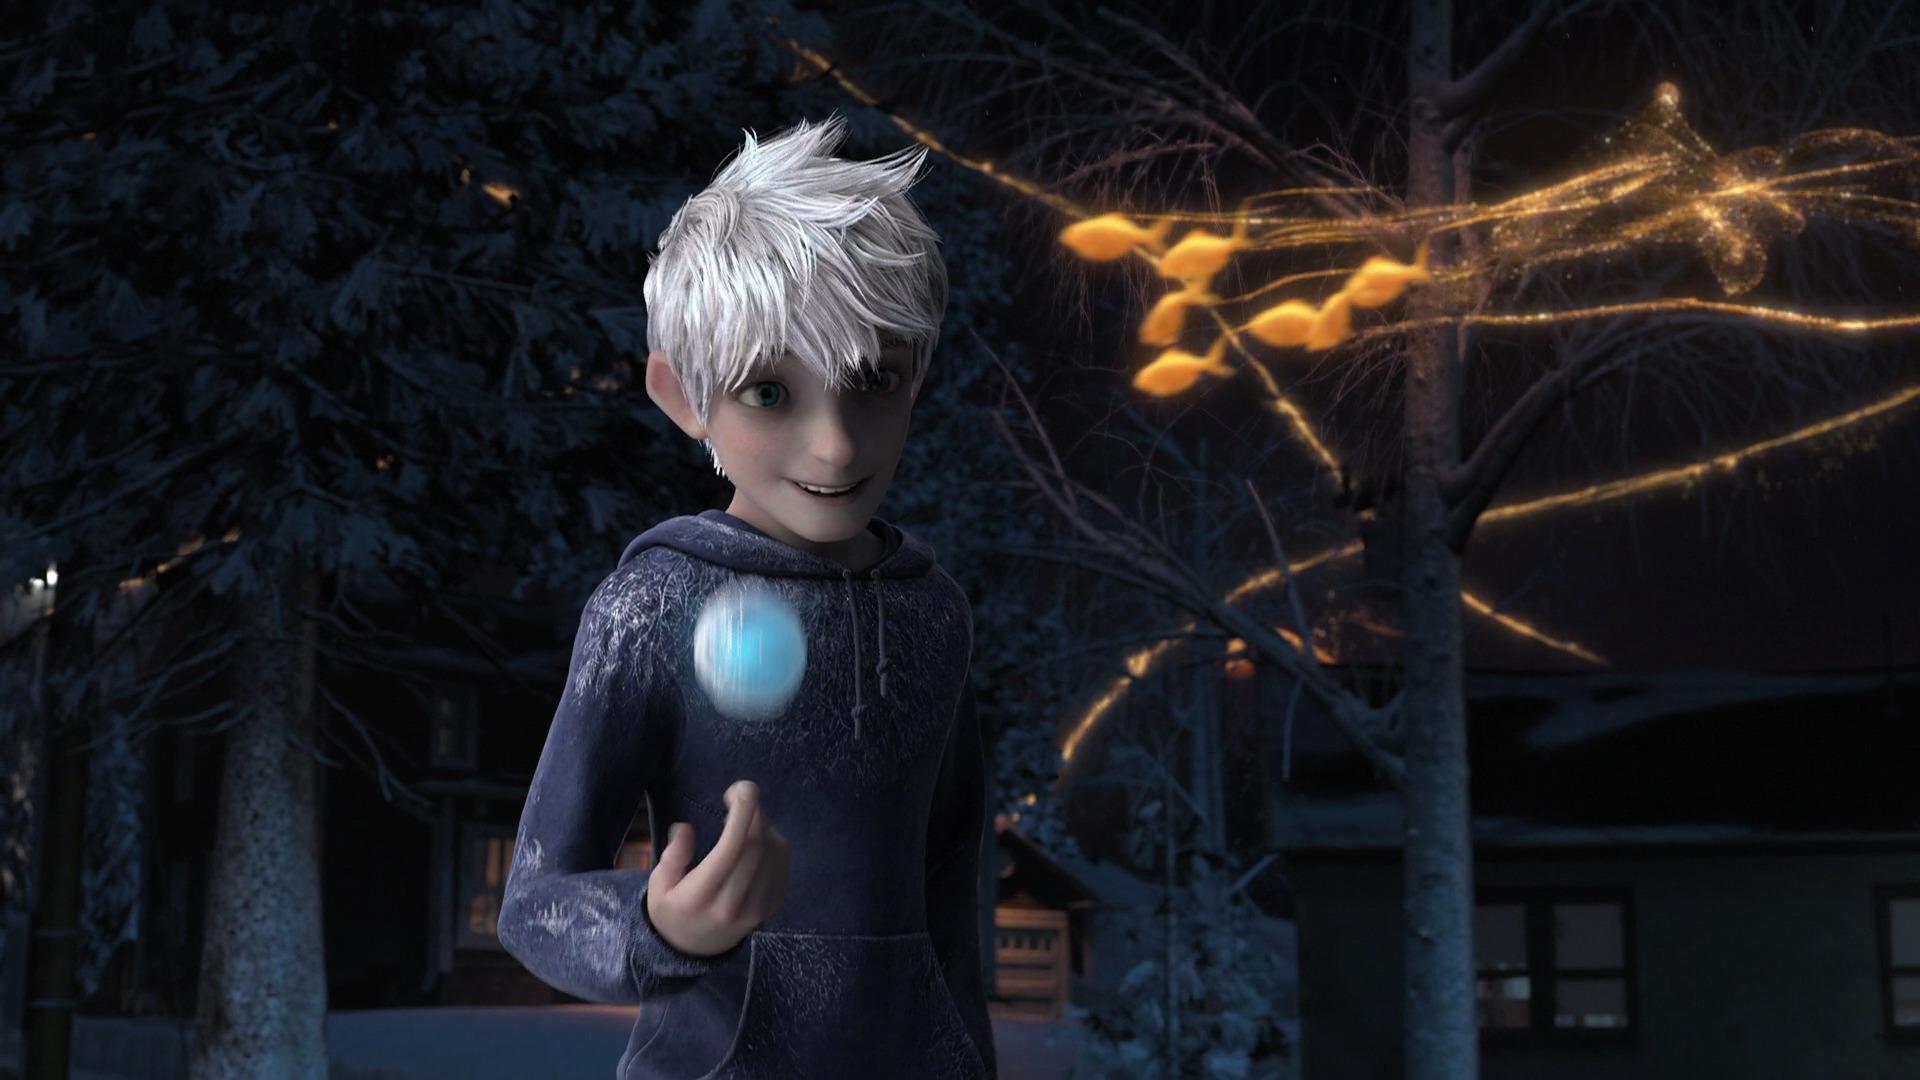 Jack Frost Dreamworks